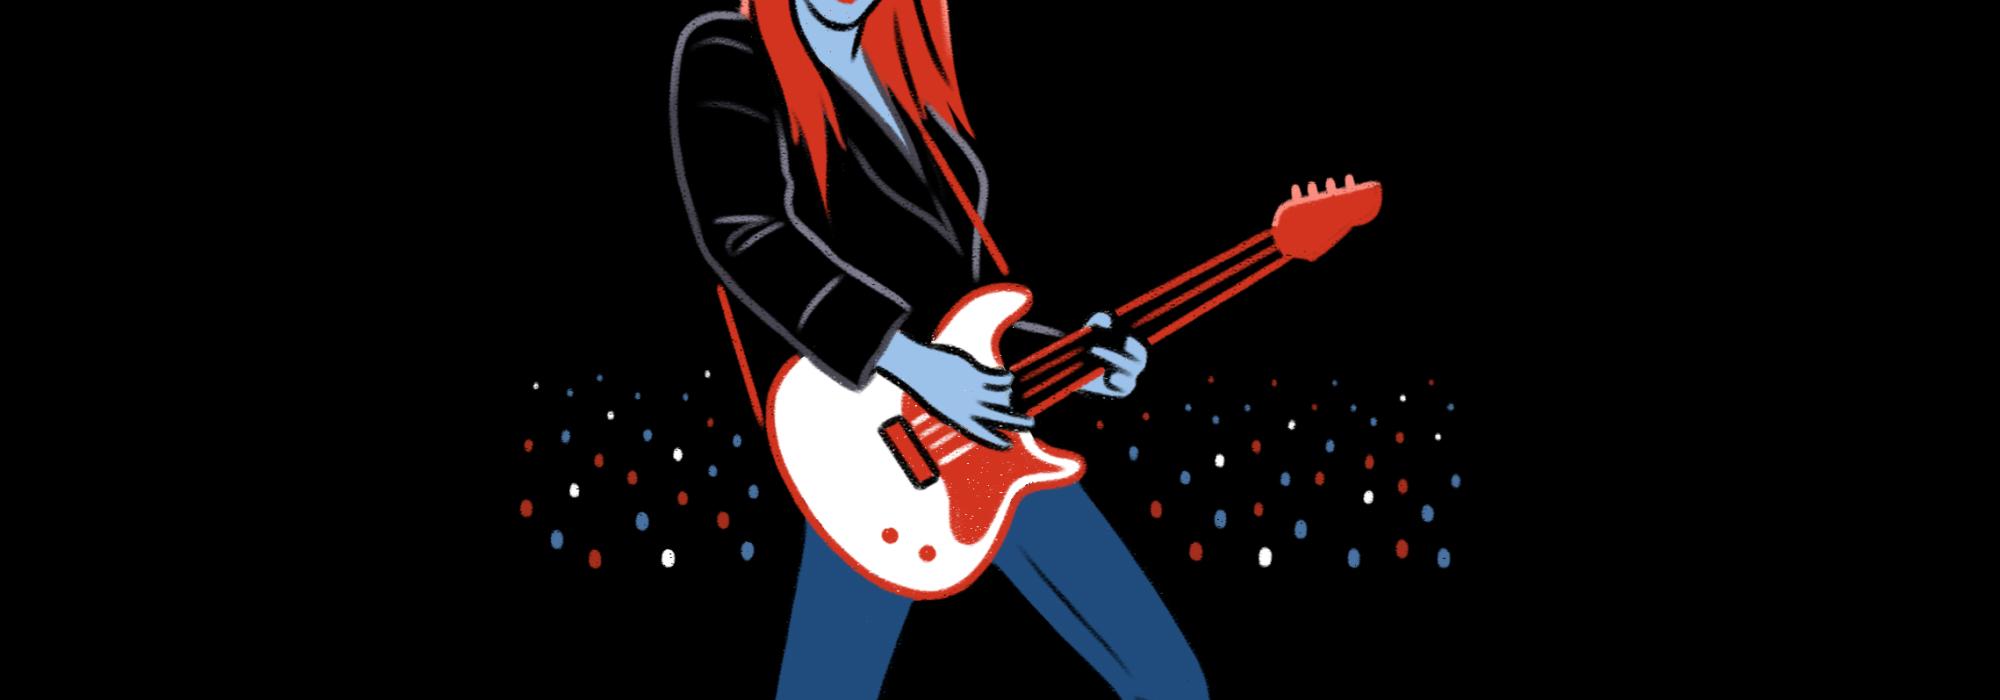 A Gimme Gimme Disco live event